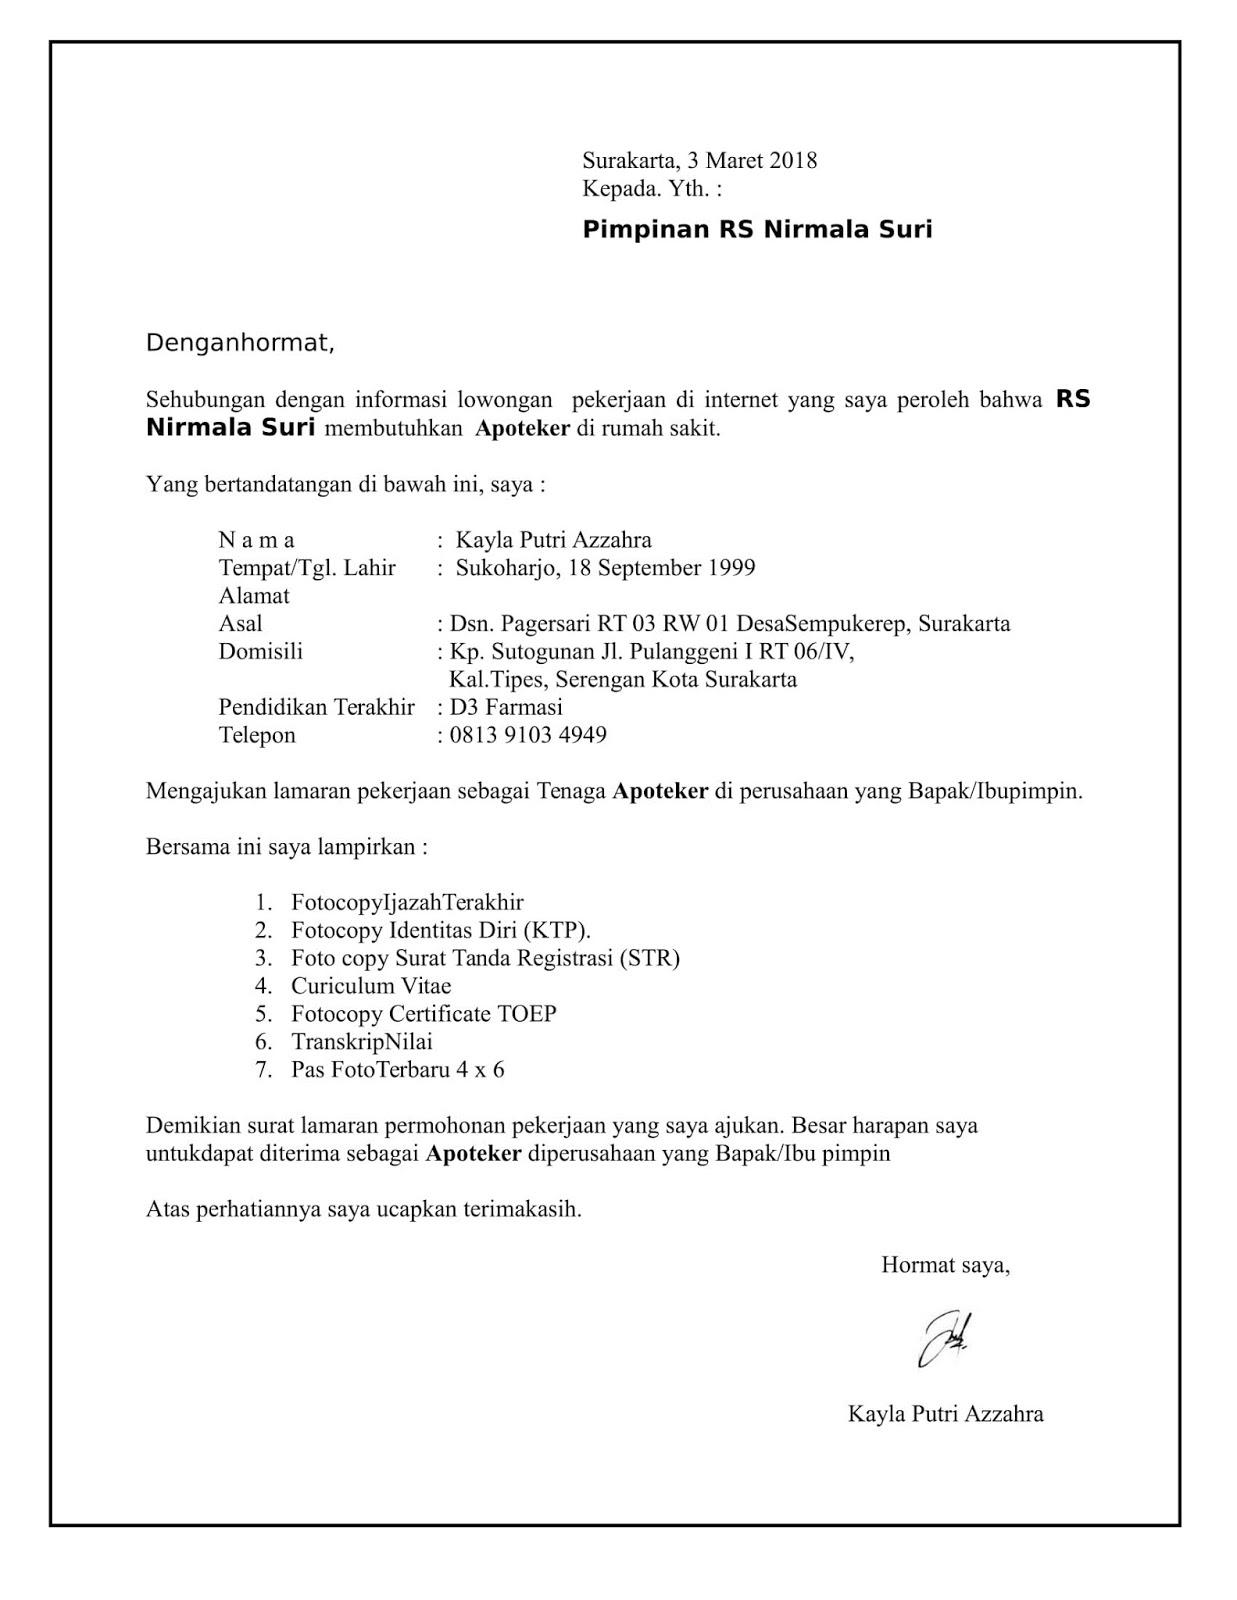 Contoh surat lamaran kerja apoteker untuk rumah sakit.